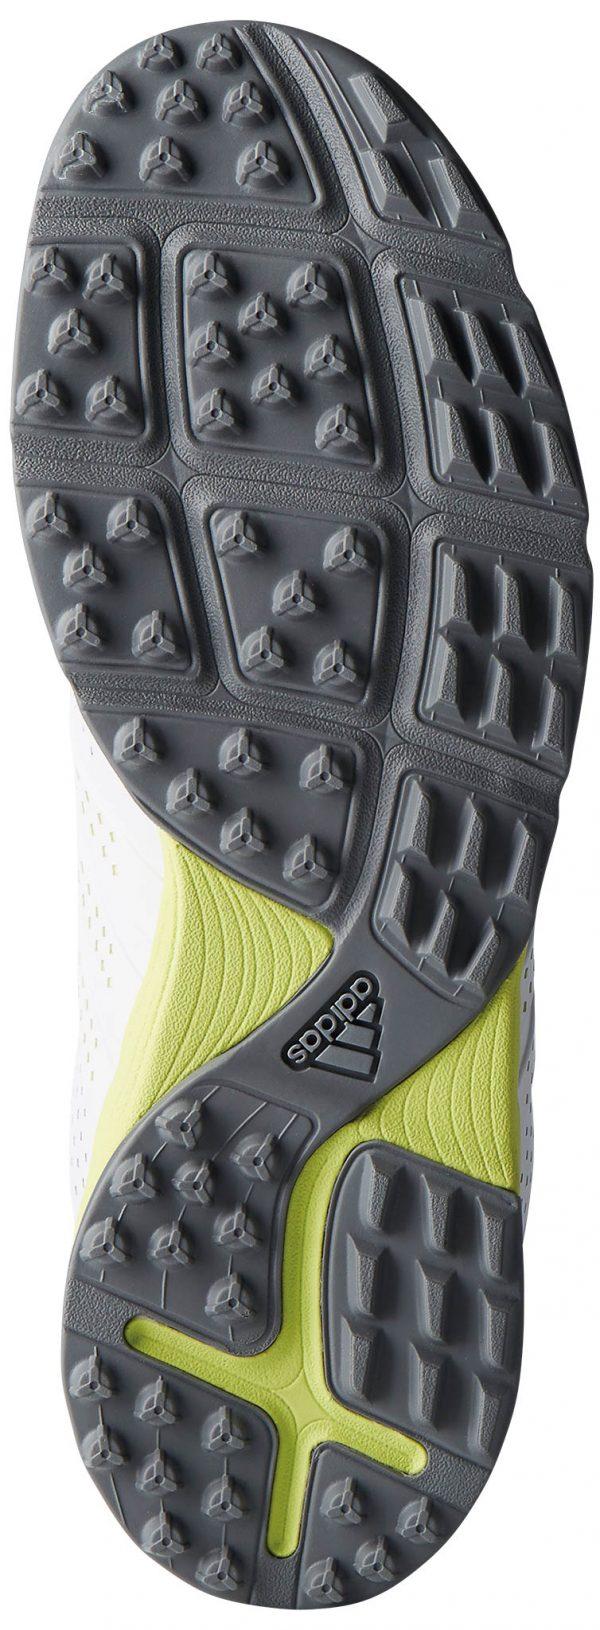 842634_adidas_adipure_sport_h_01